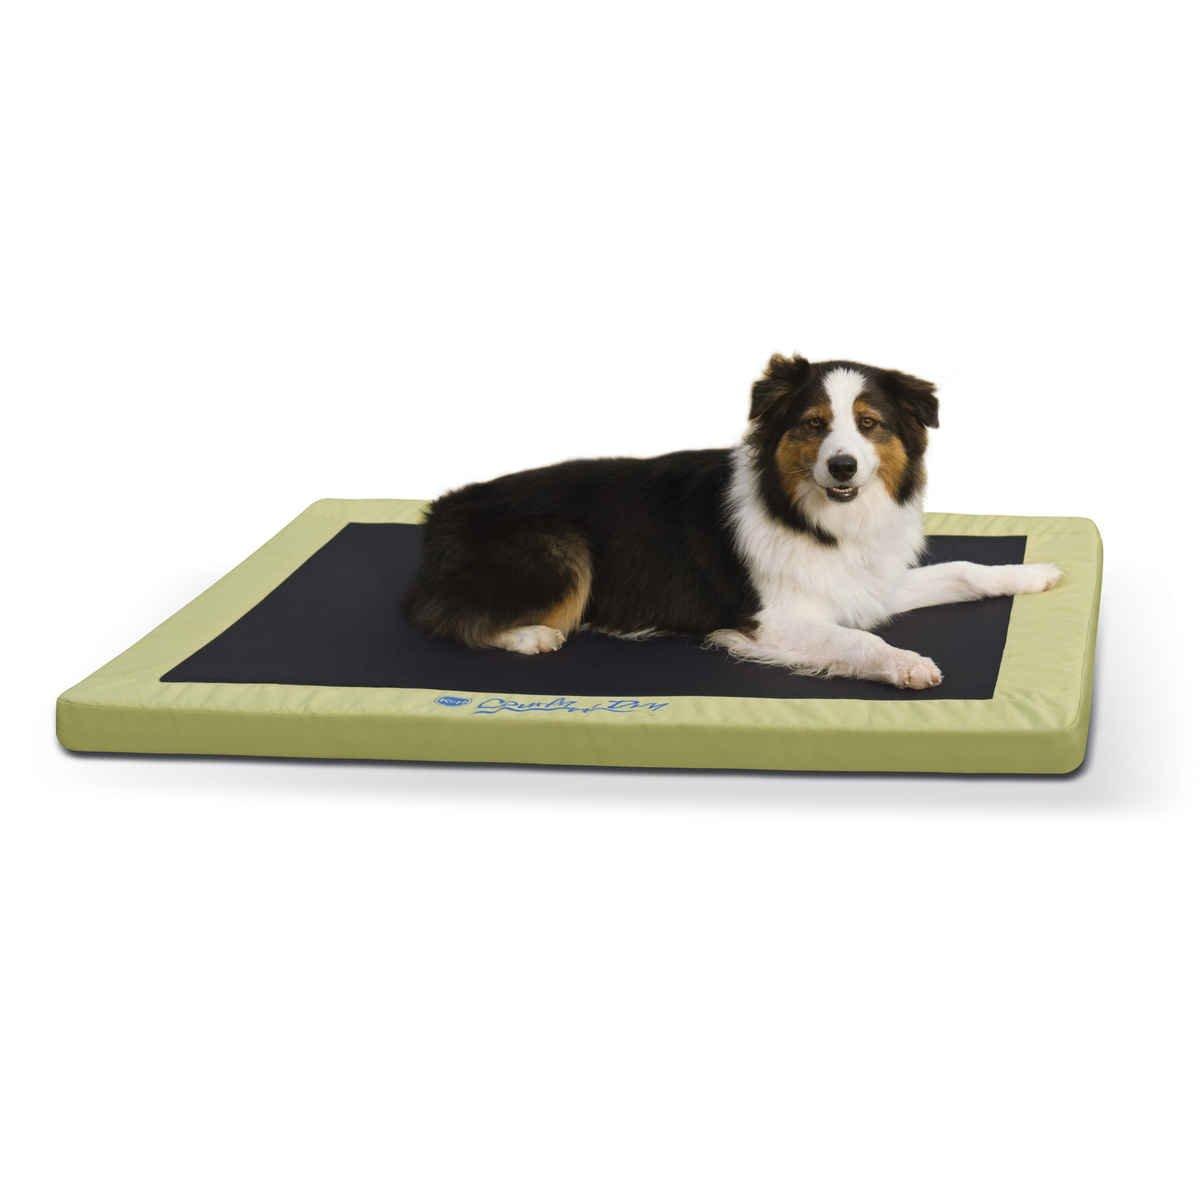 【K&Hペットプロダクツ】室内外で使用できる最も快適に過ごせるペットベッド! ひんやりグッズ コンフィドライペットベッドL ライムグリーン